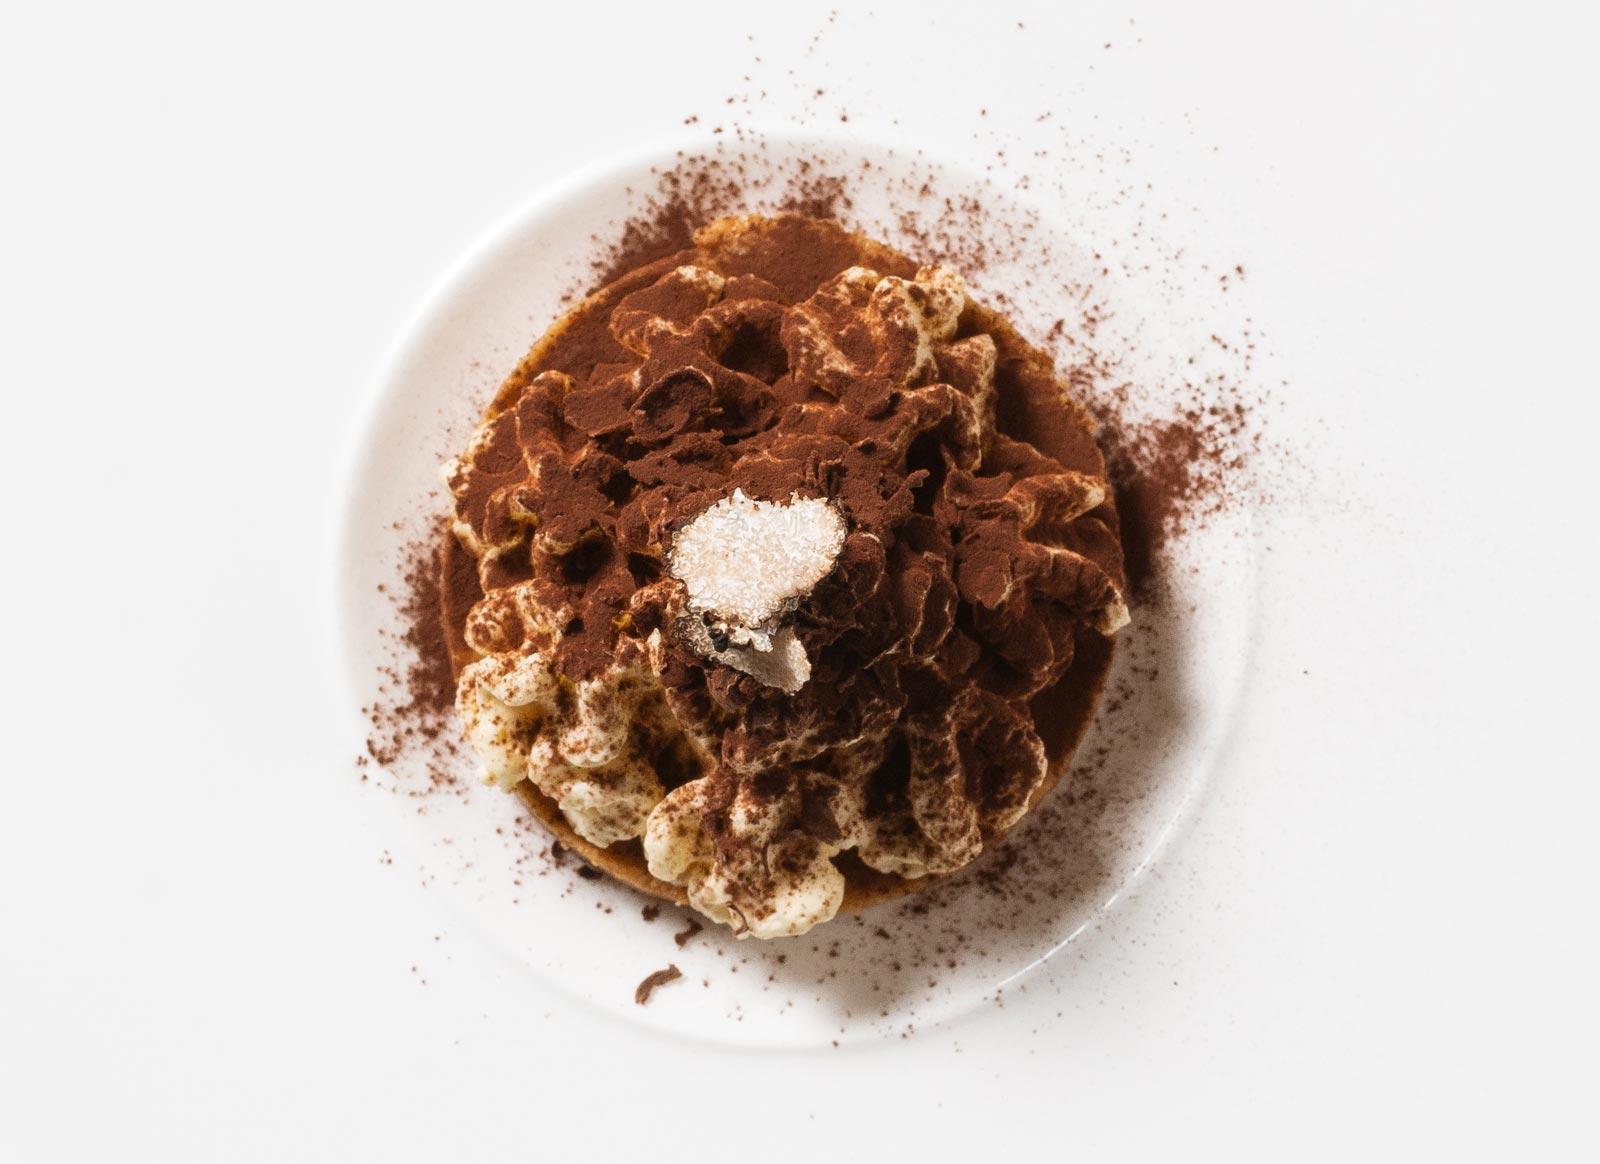 Truffle-flavoured tiramisù